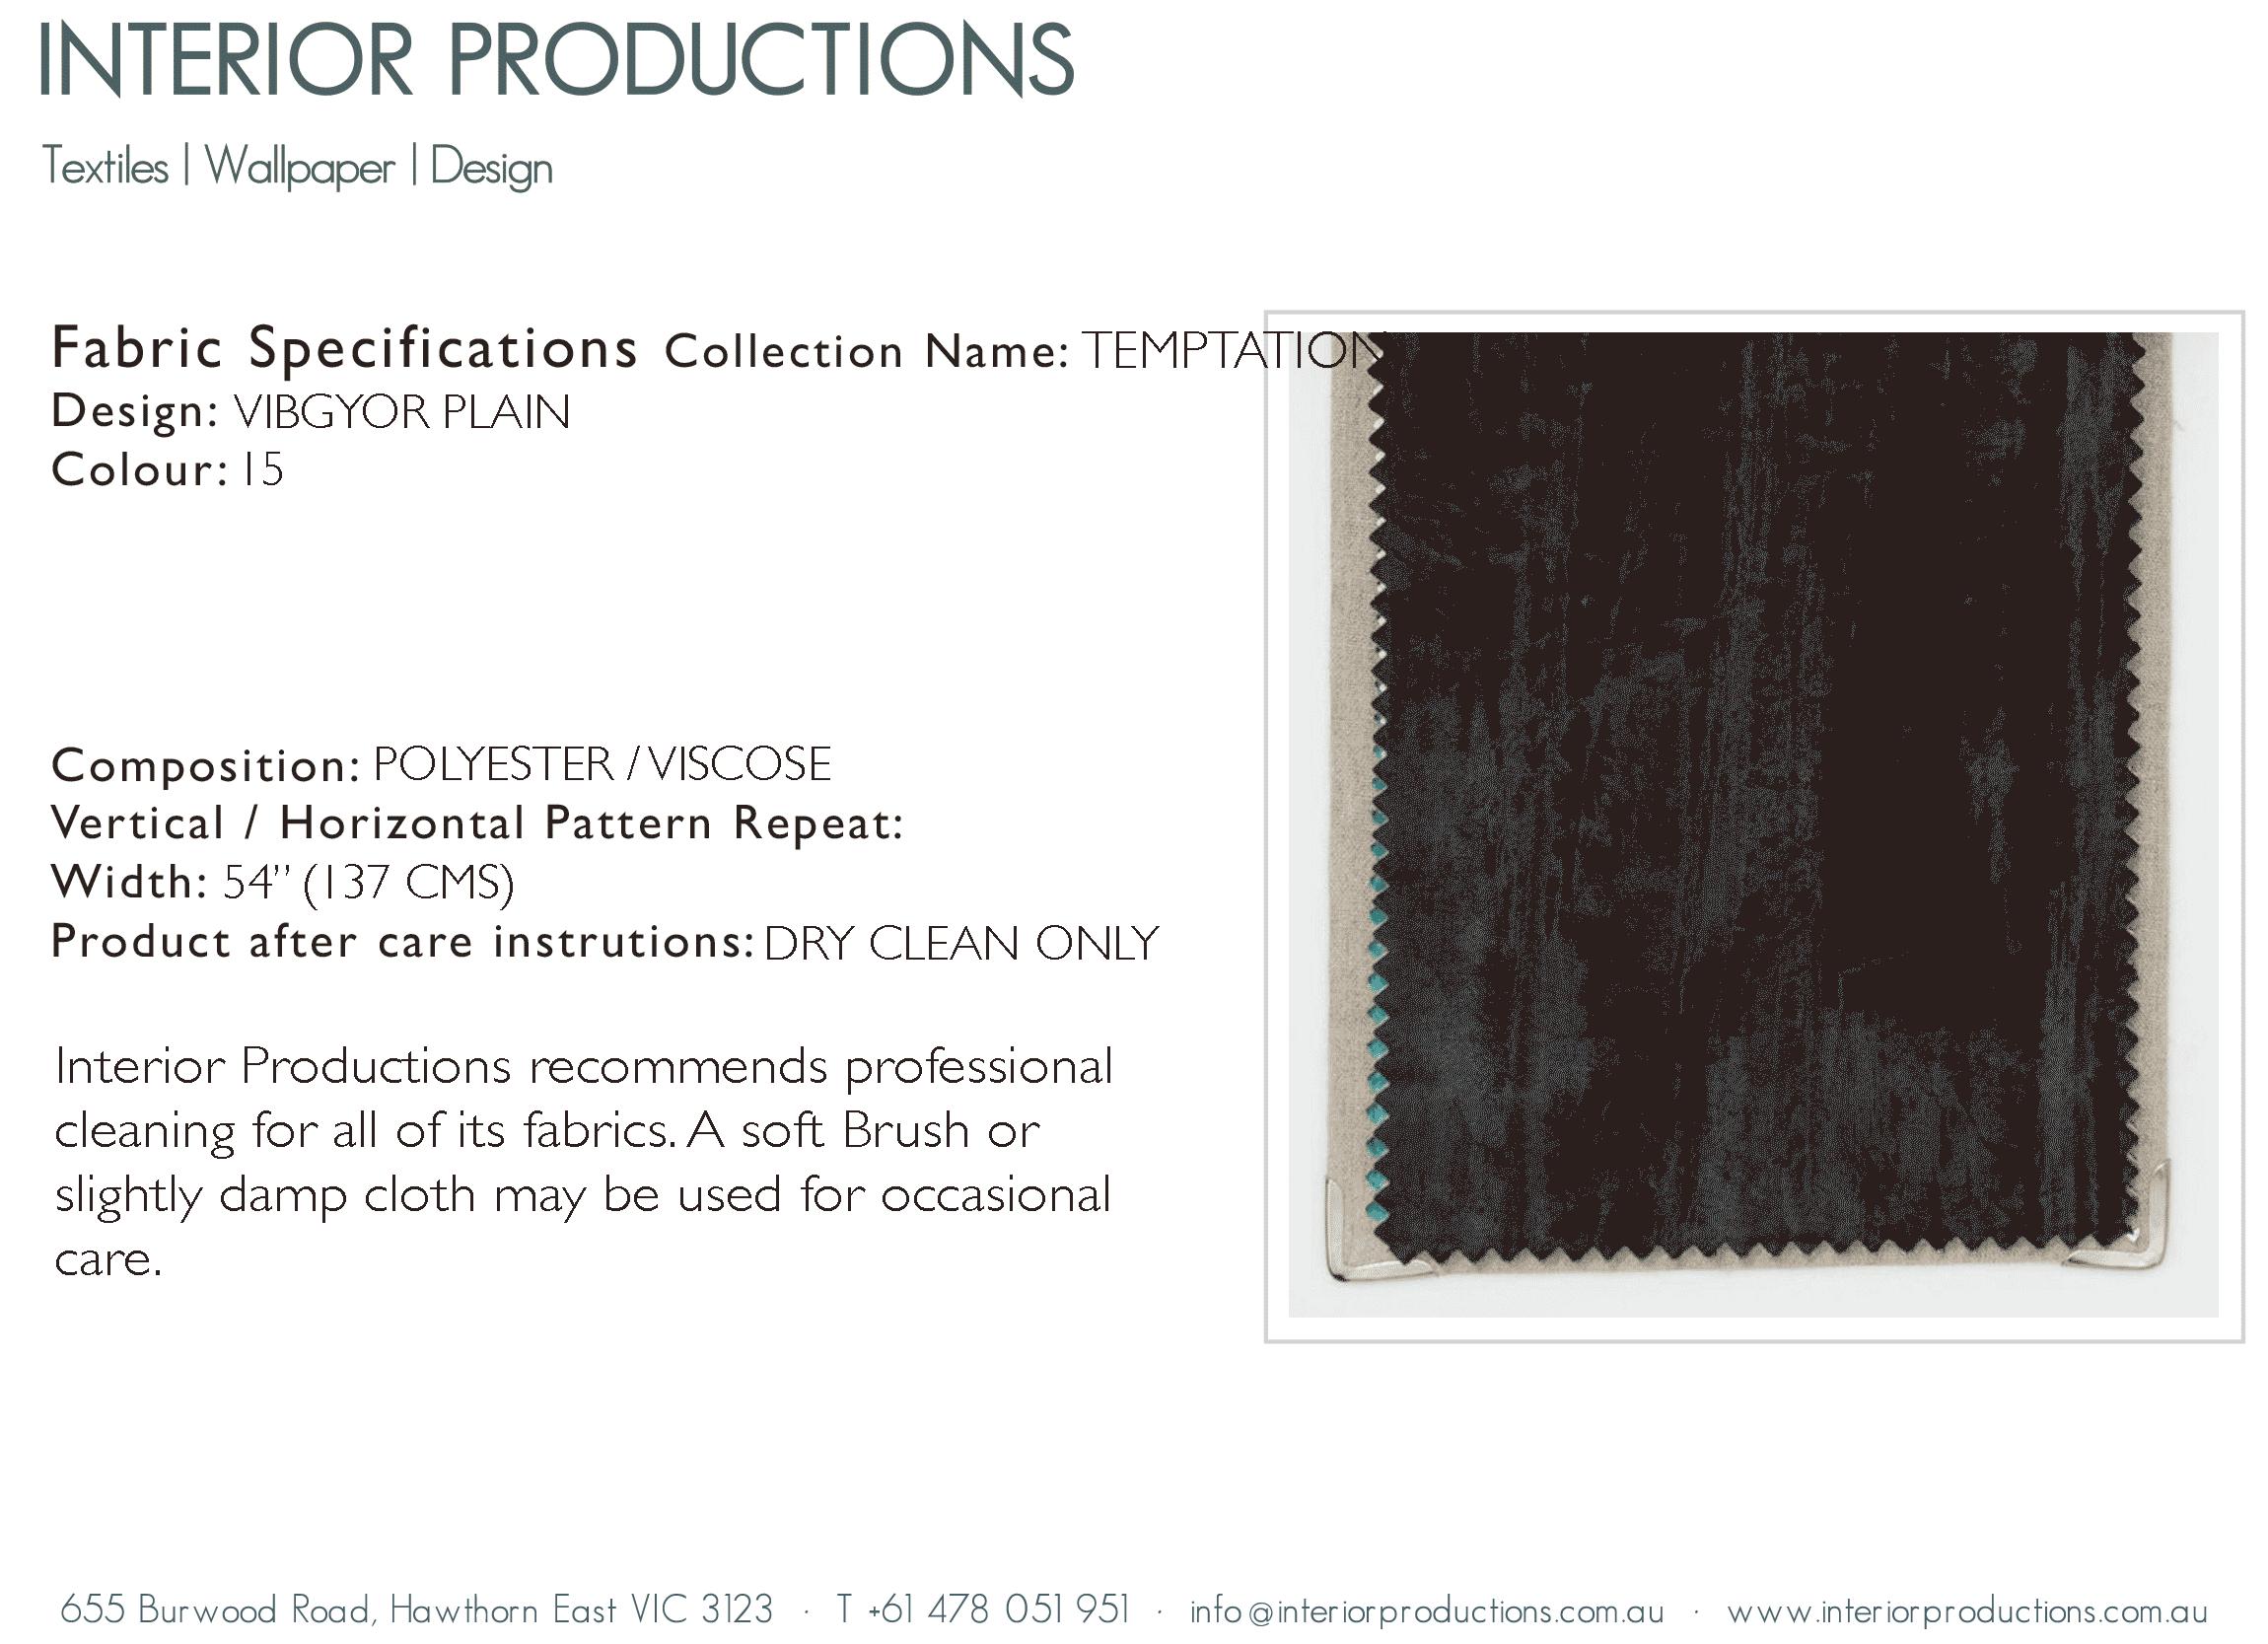 interior_productions_VIBGYOR-PLAIN---15